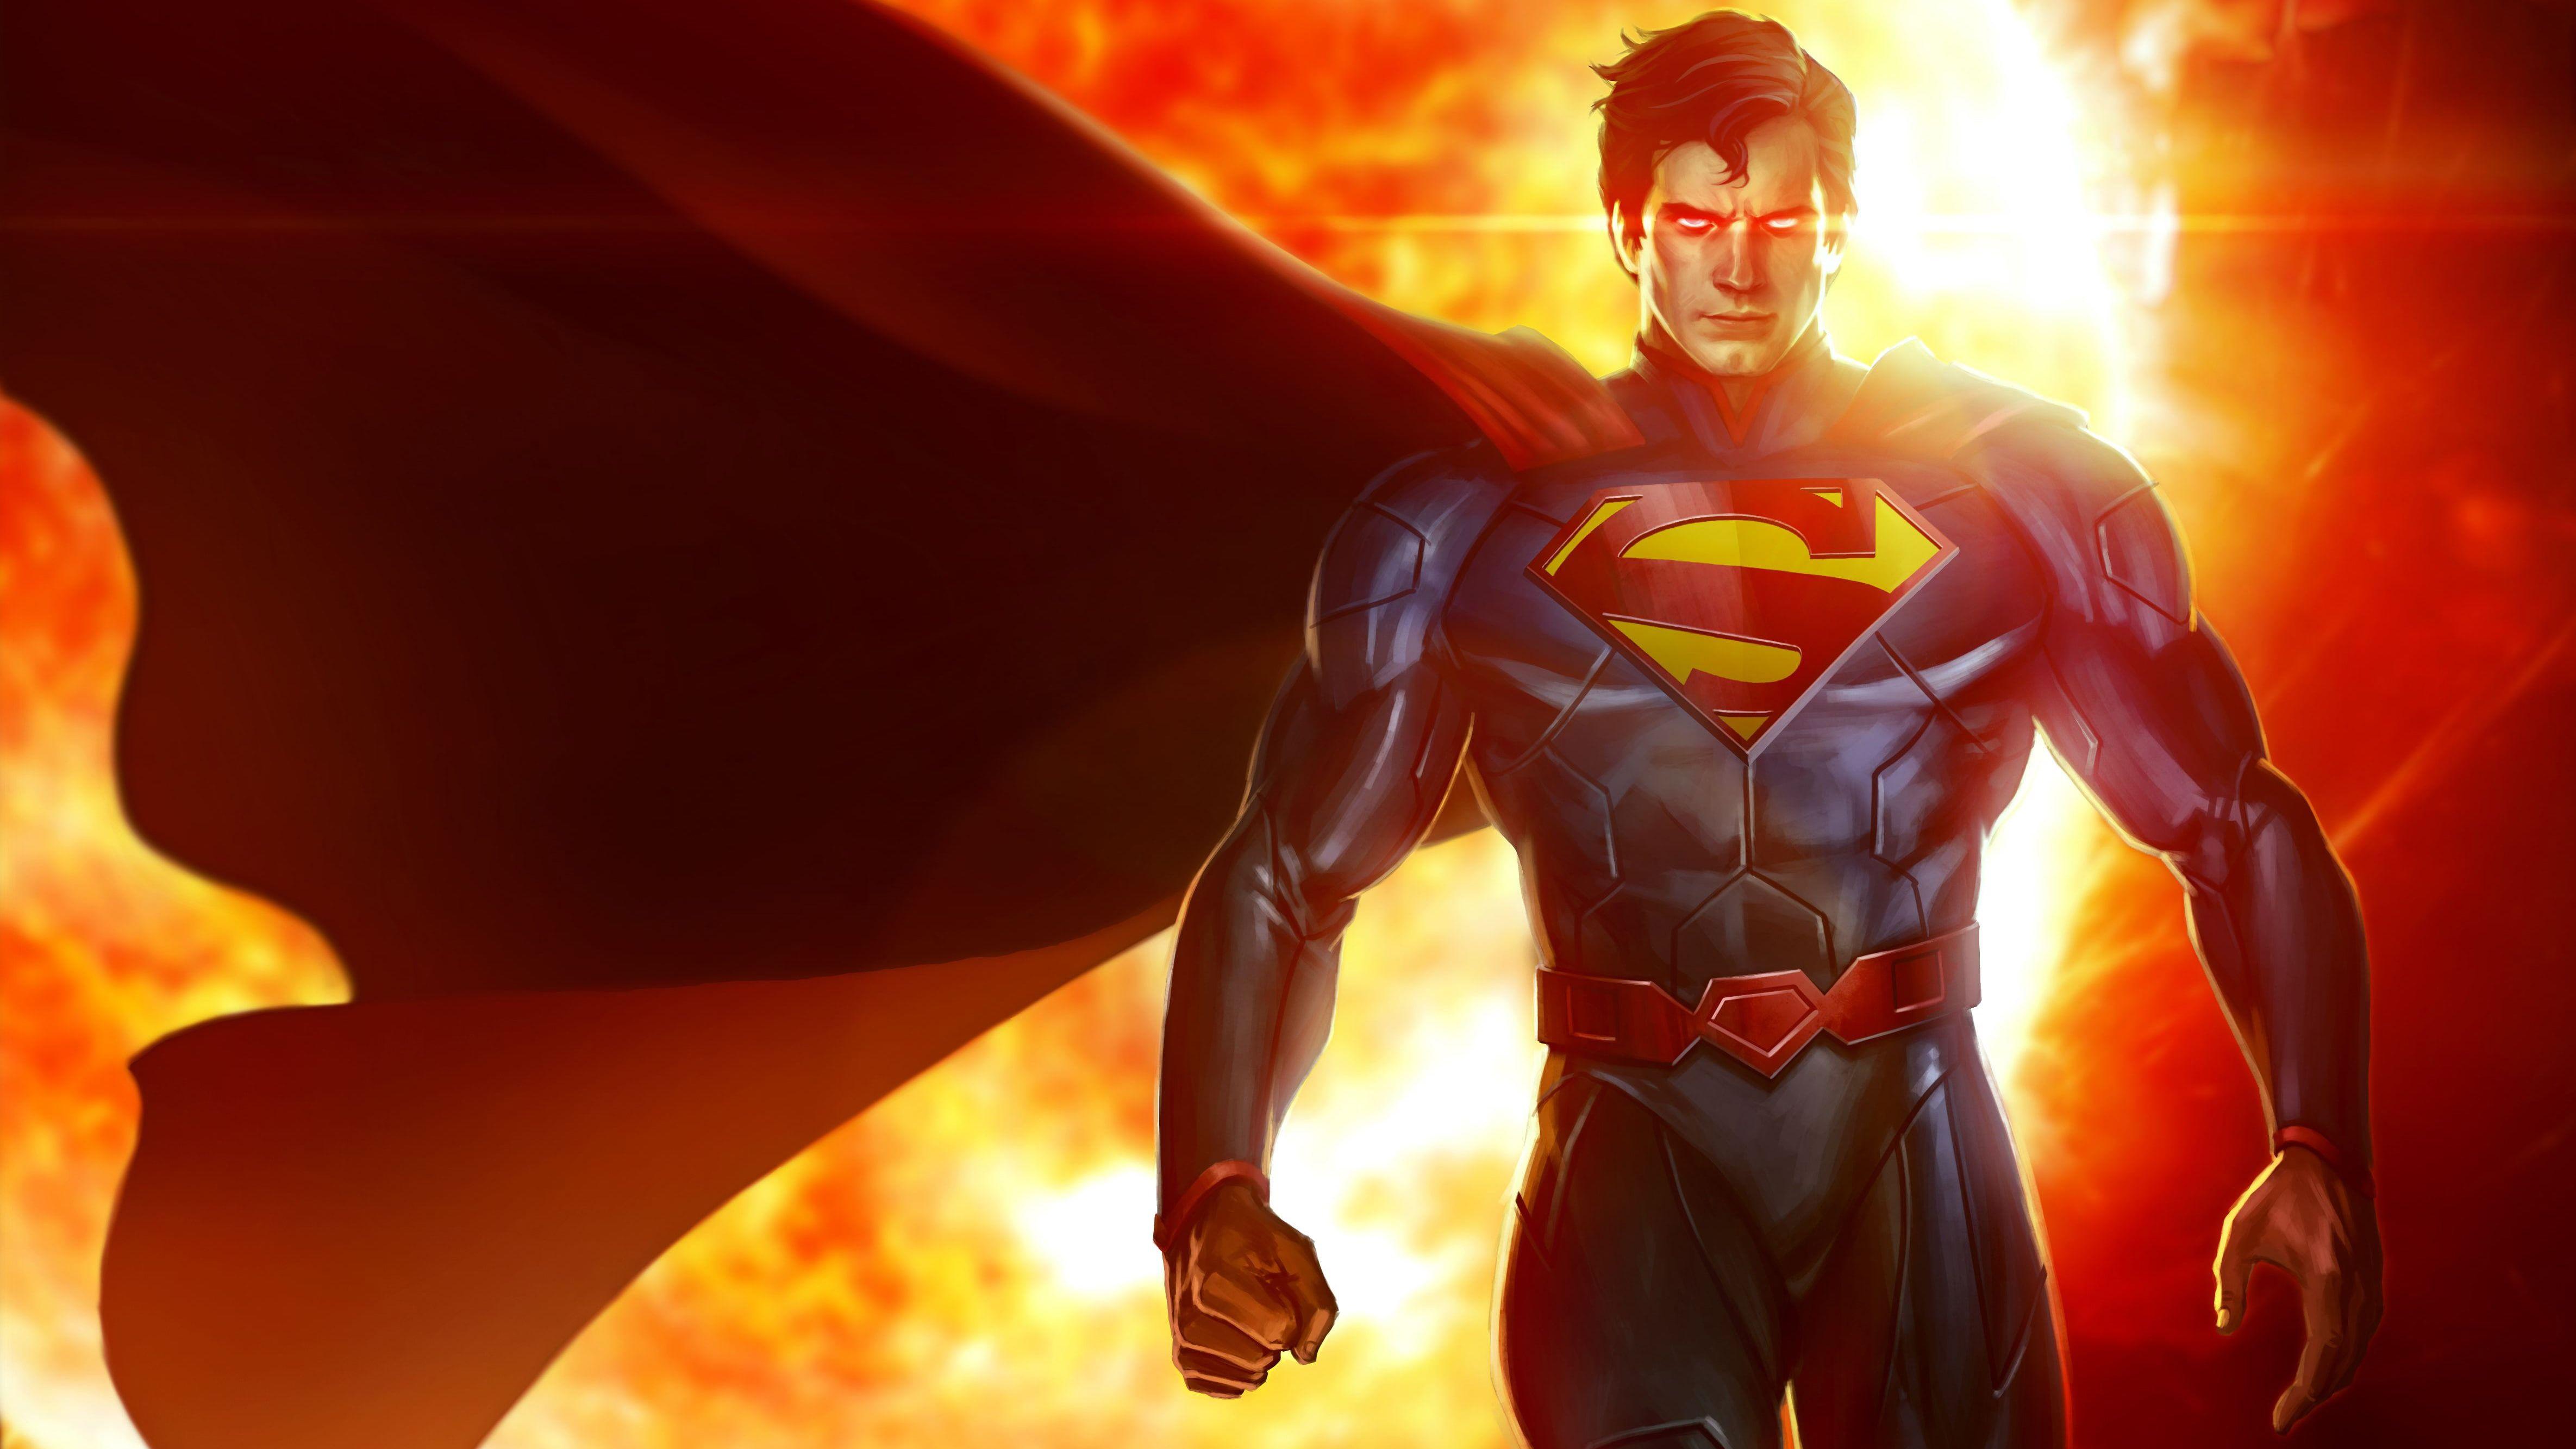 Superheroes 4k Superman Dc Comics 4k Wallpaper Hdwallpaper Desktop